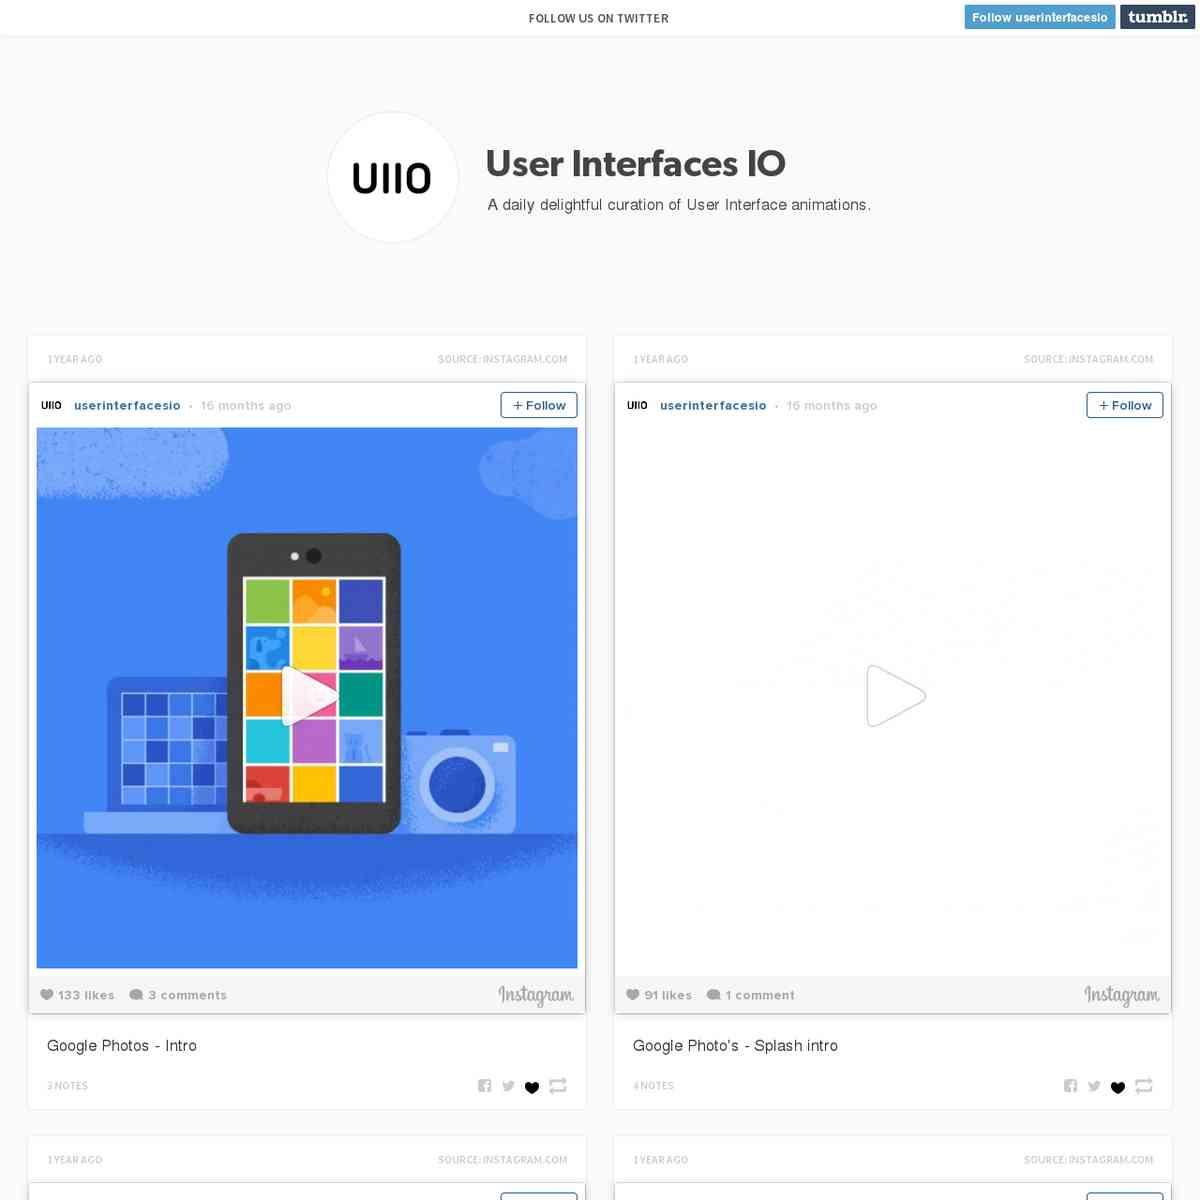 User Interfaces IO